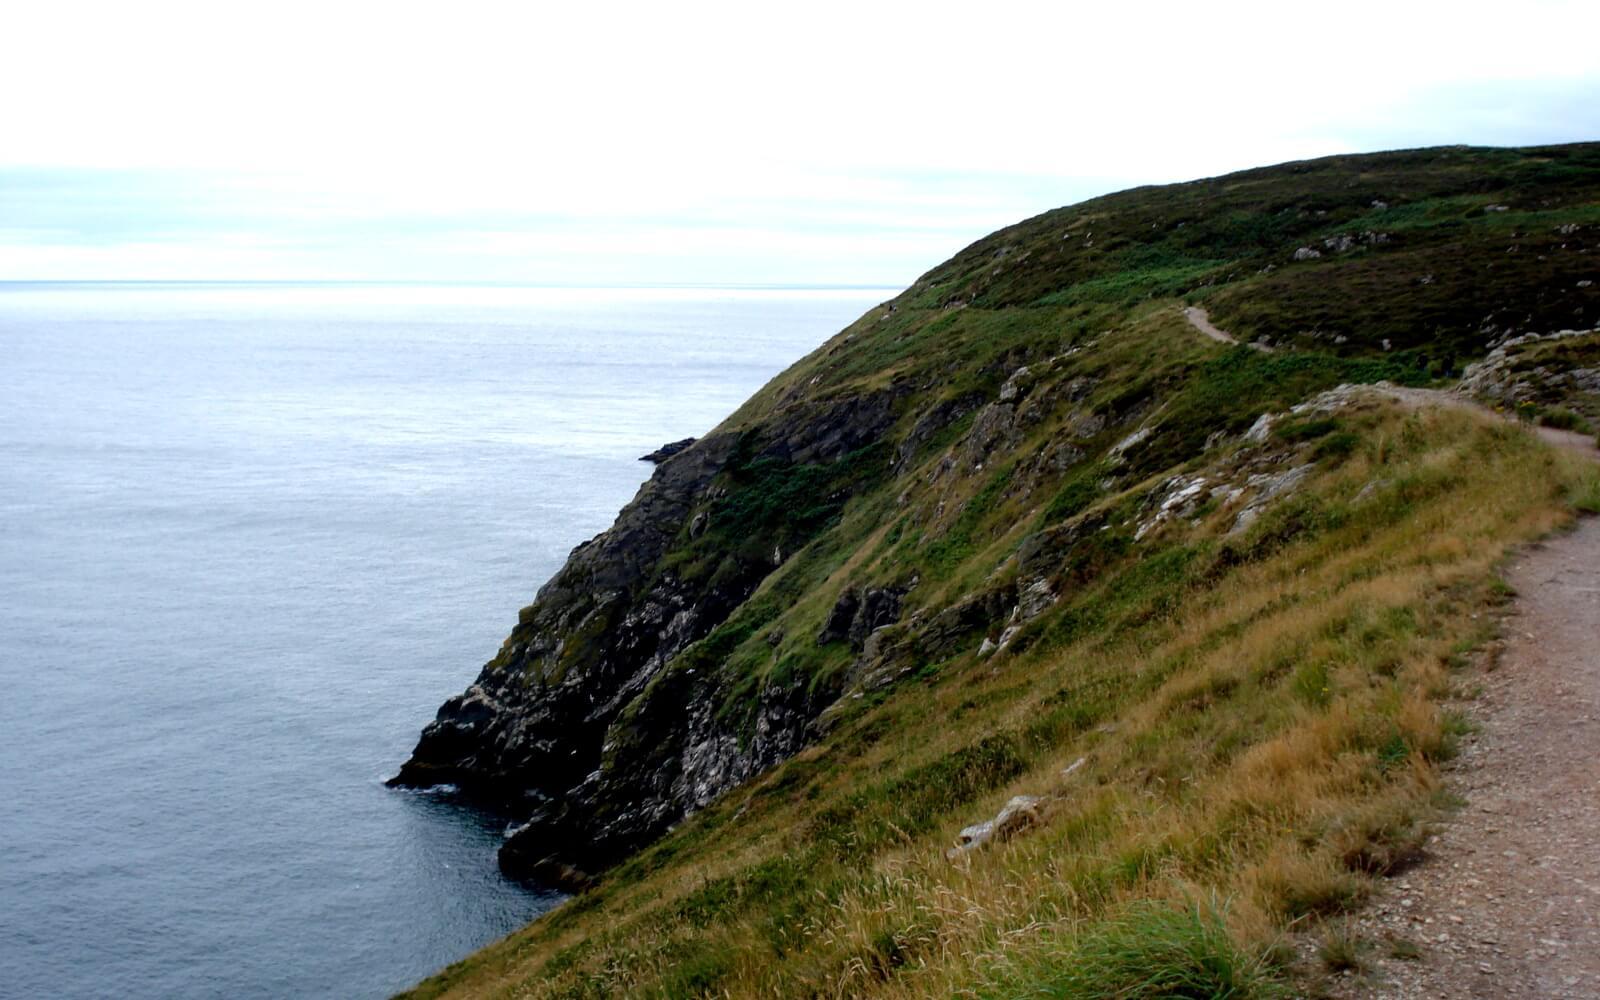 Irland - hohe Klippen